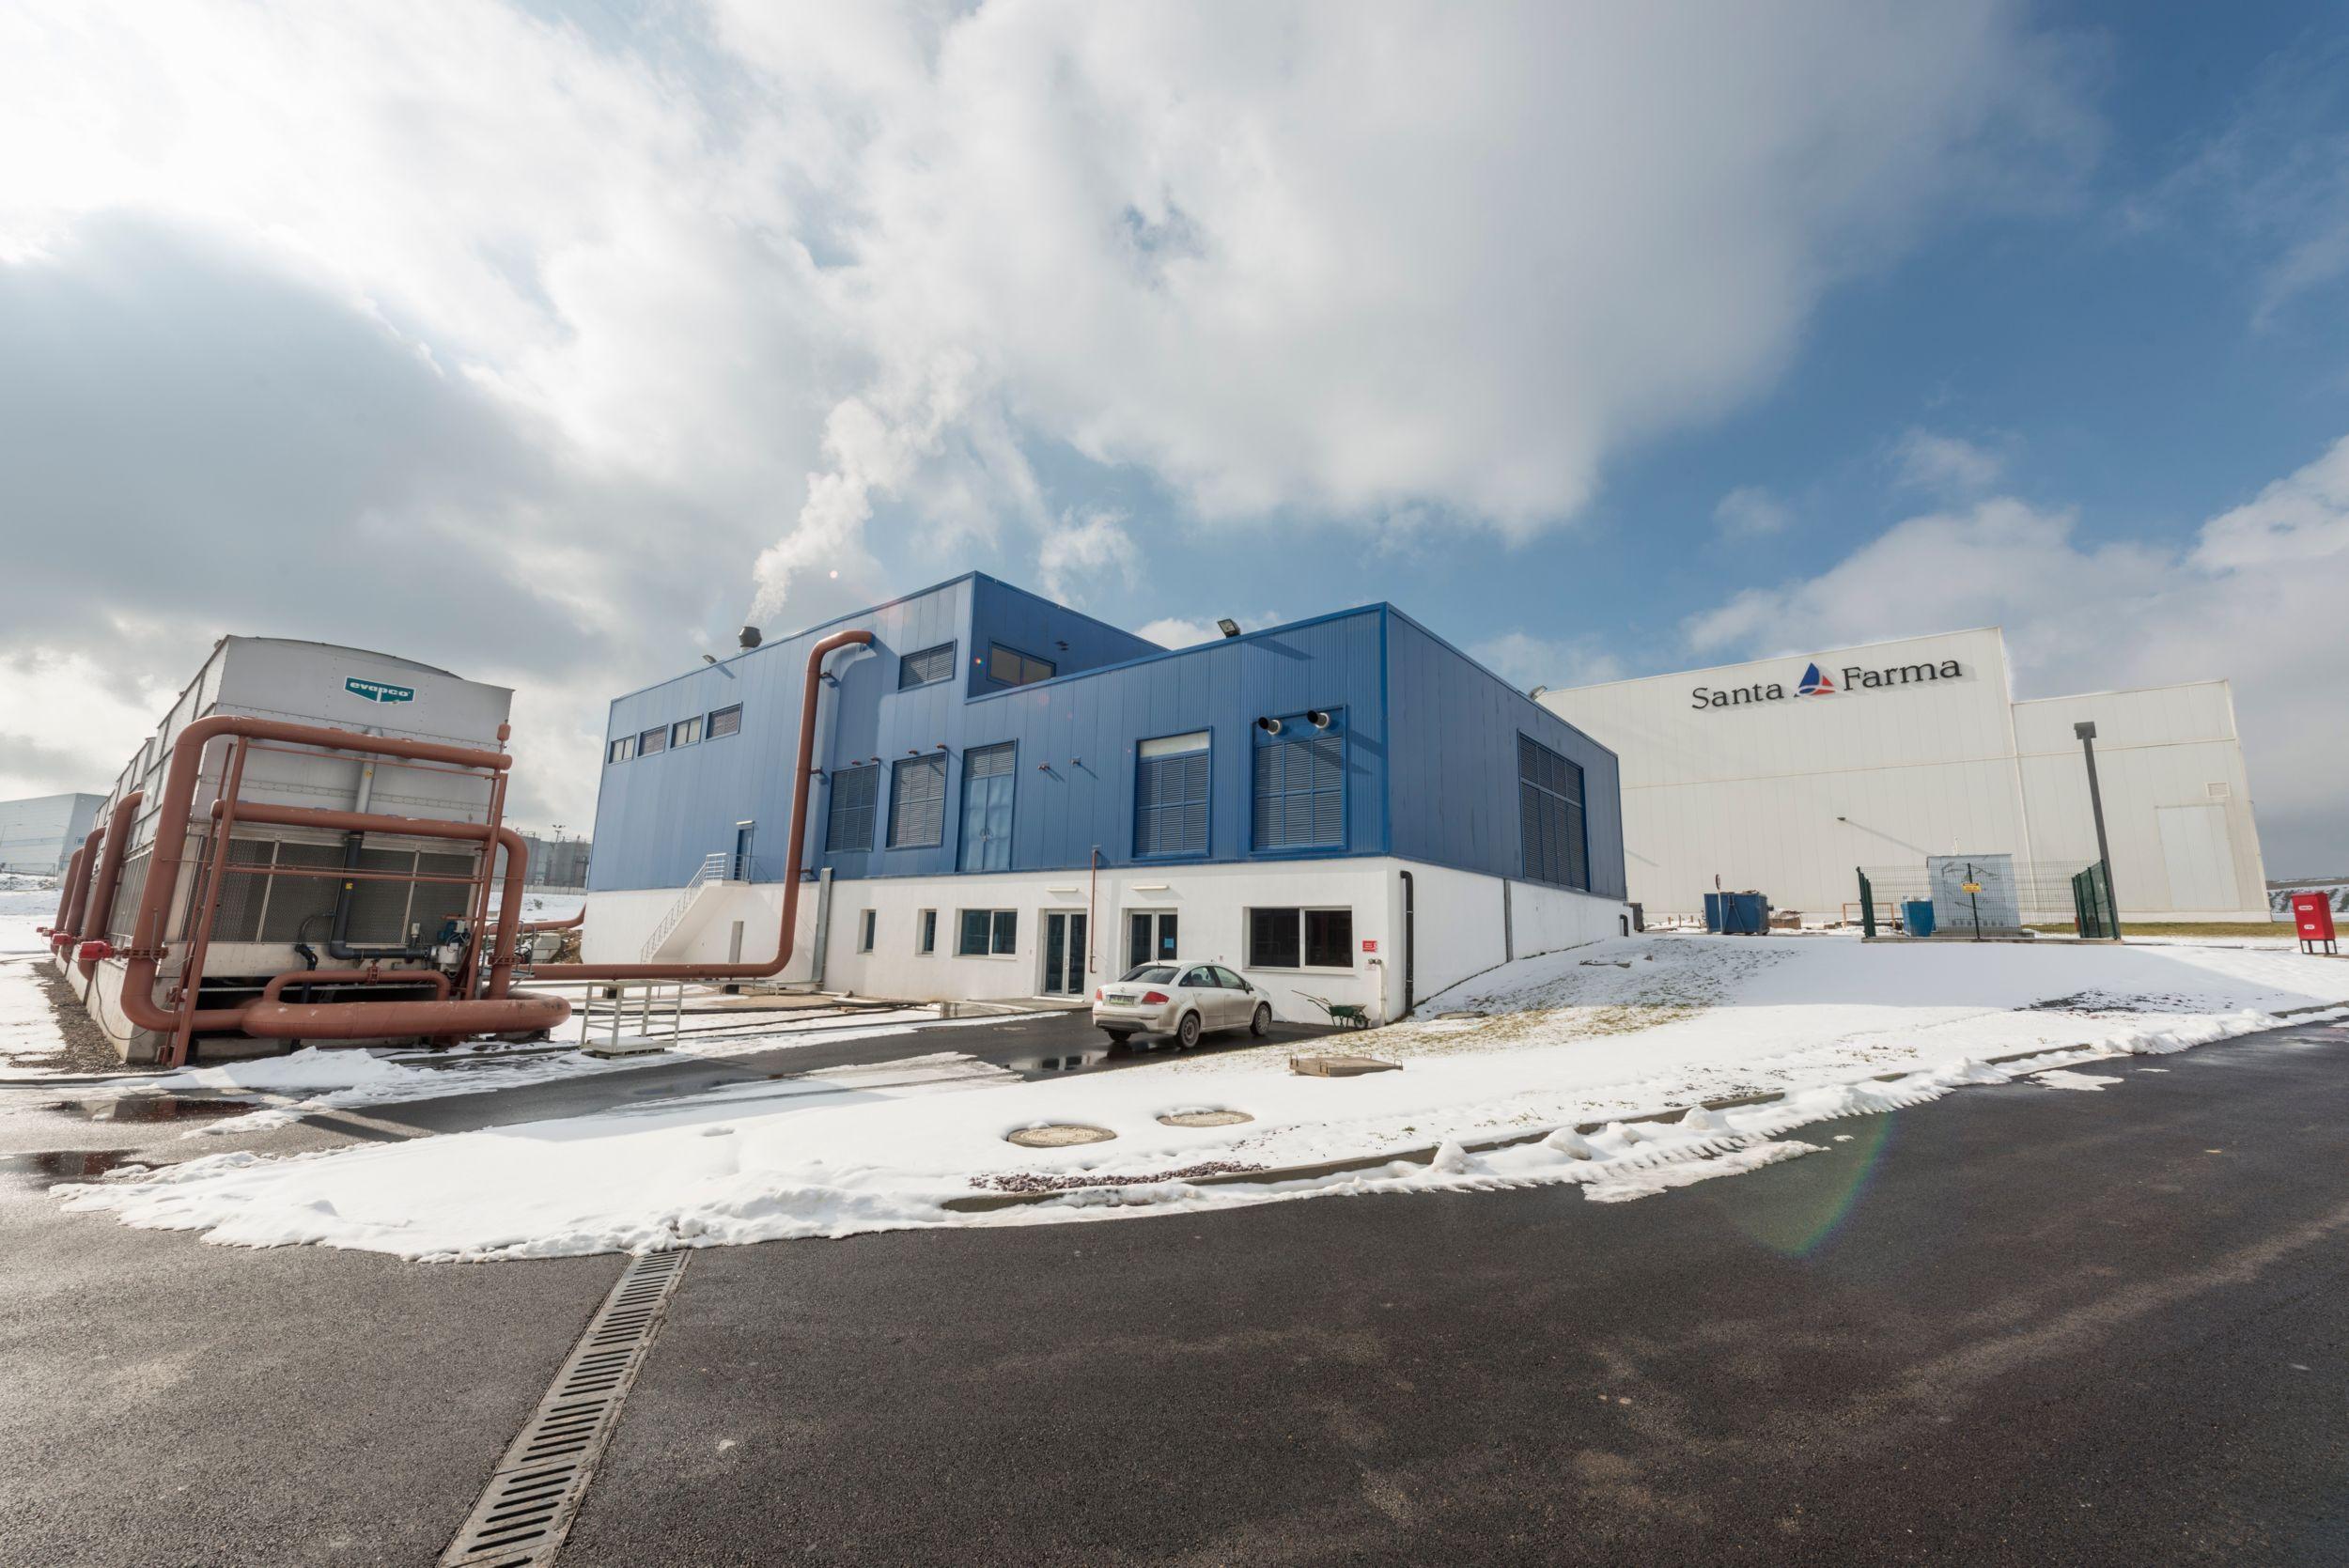 Santa Farma Medicine Production standby power